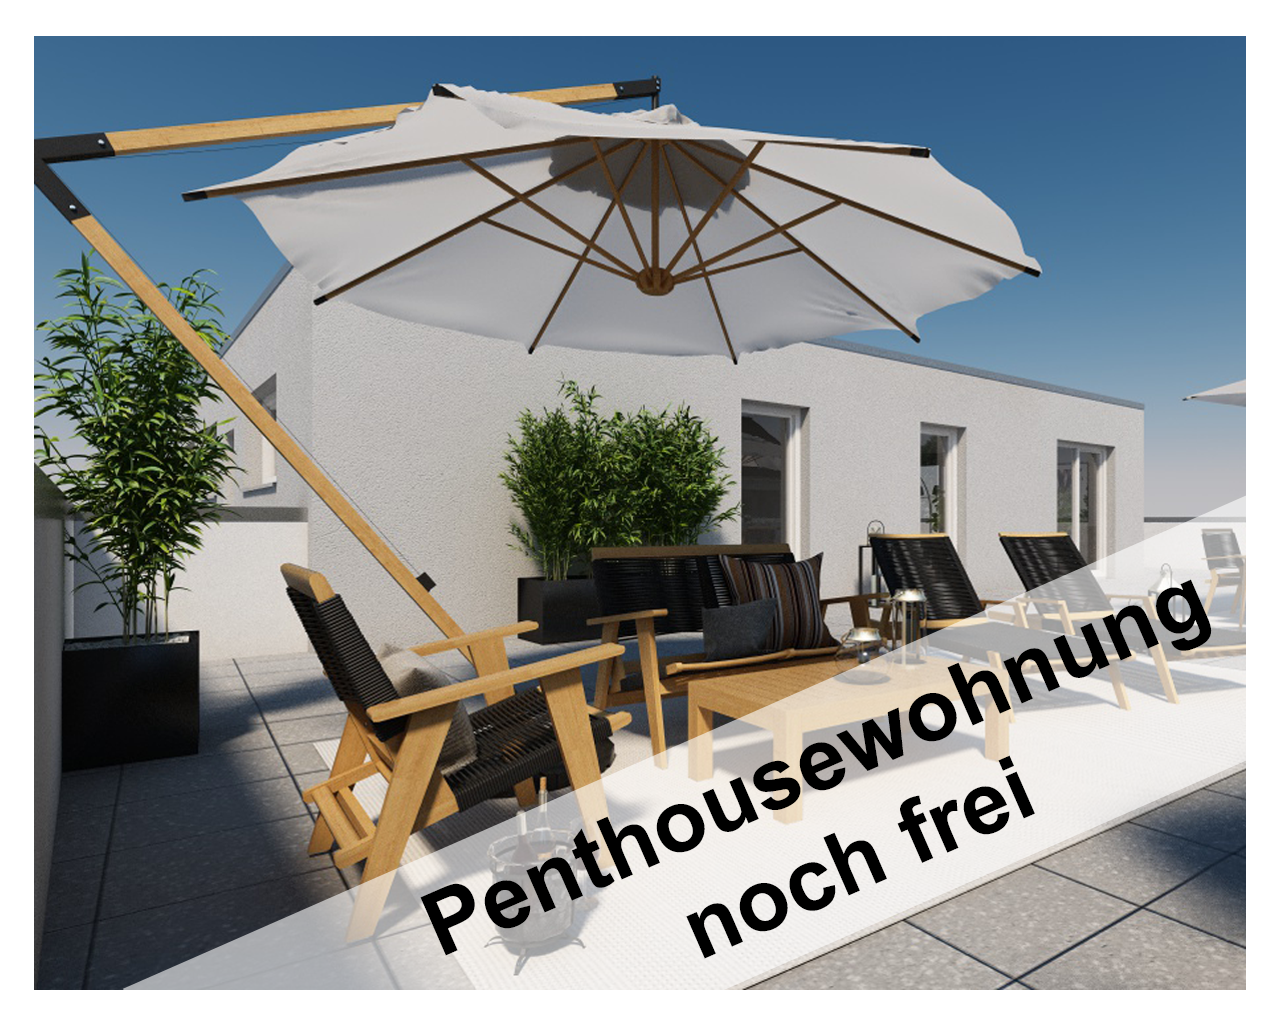 Penthouse, Trier Pauklinstr. 10-12, Wohnung 22